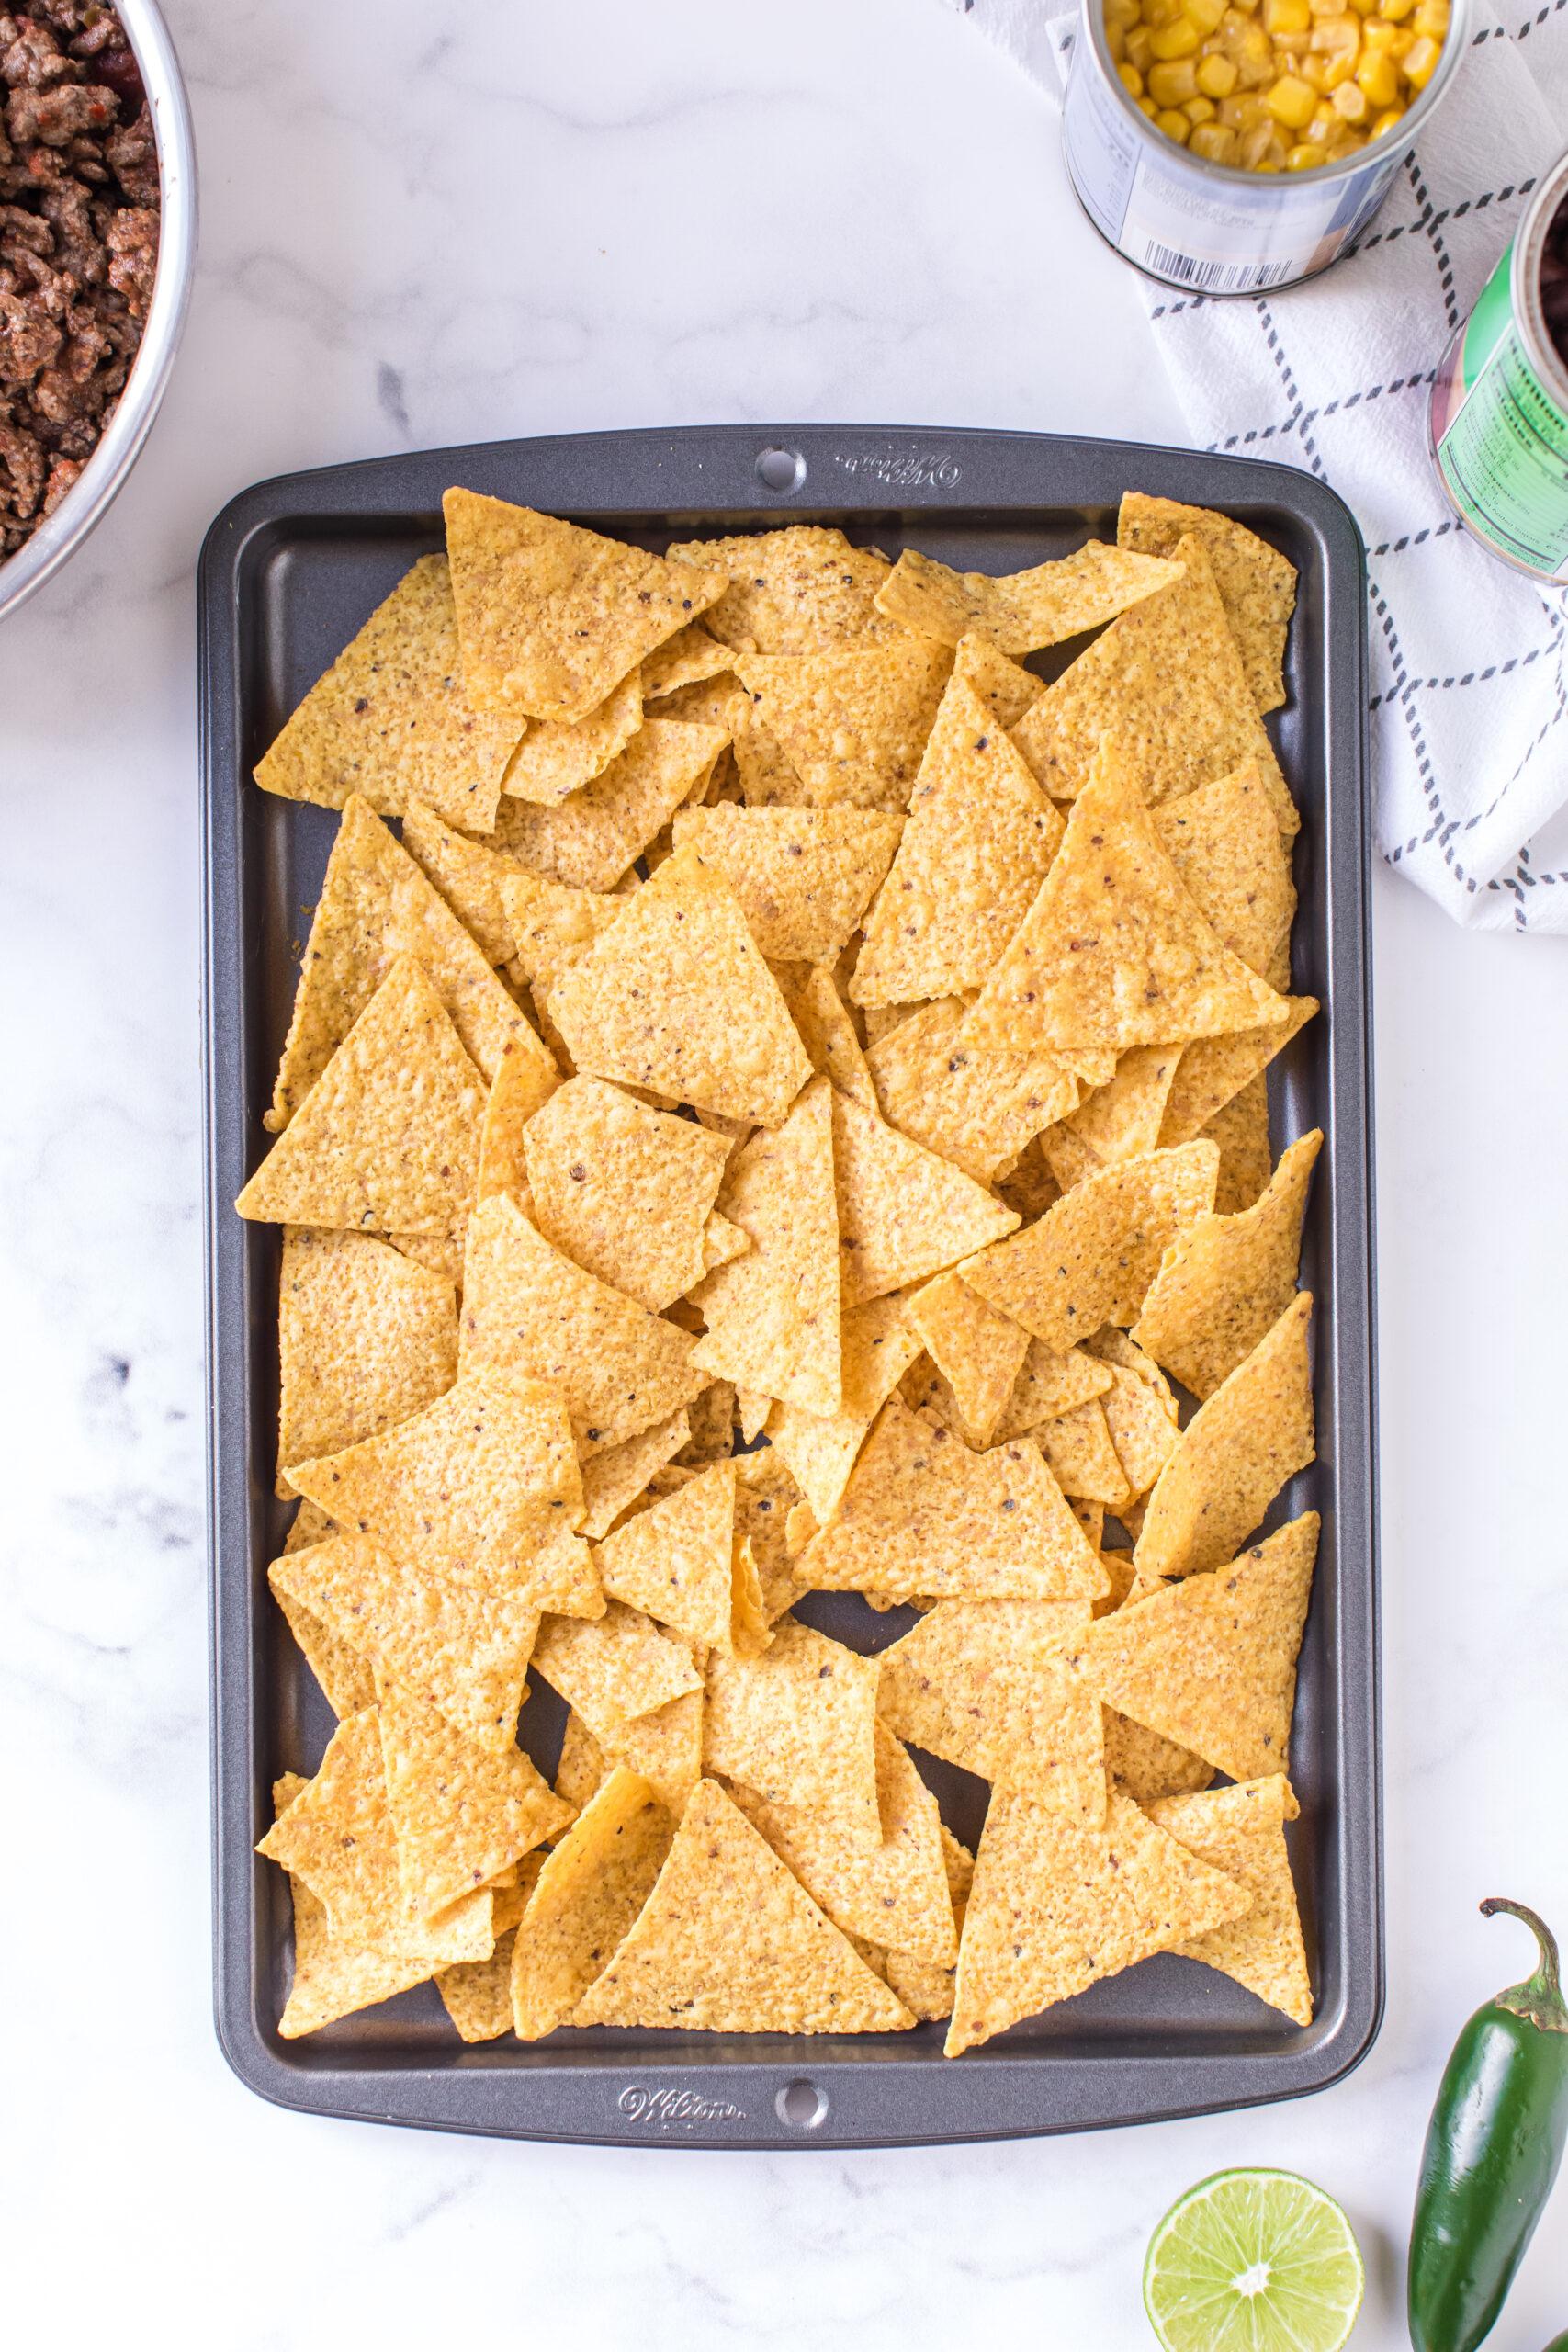 baking sheet with plain tortilla chips added